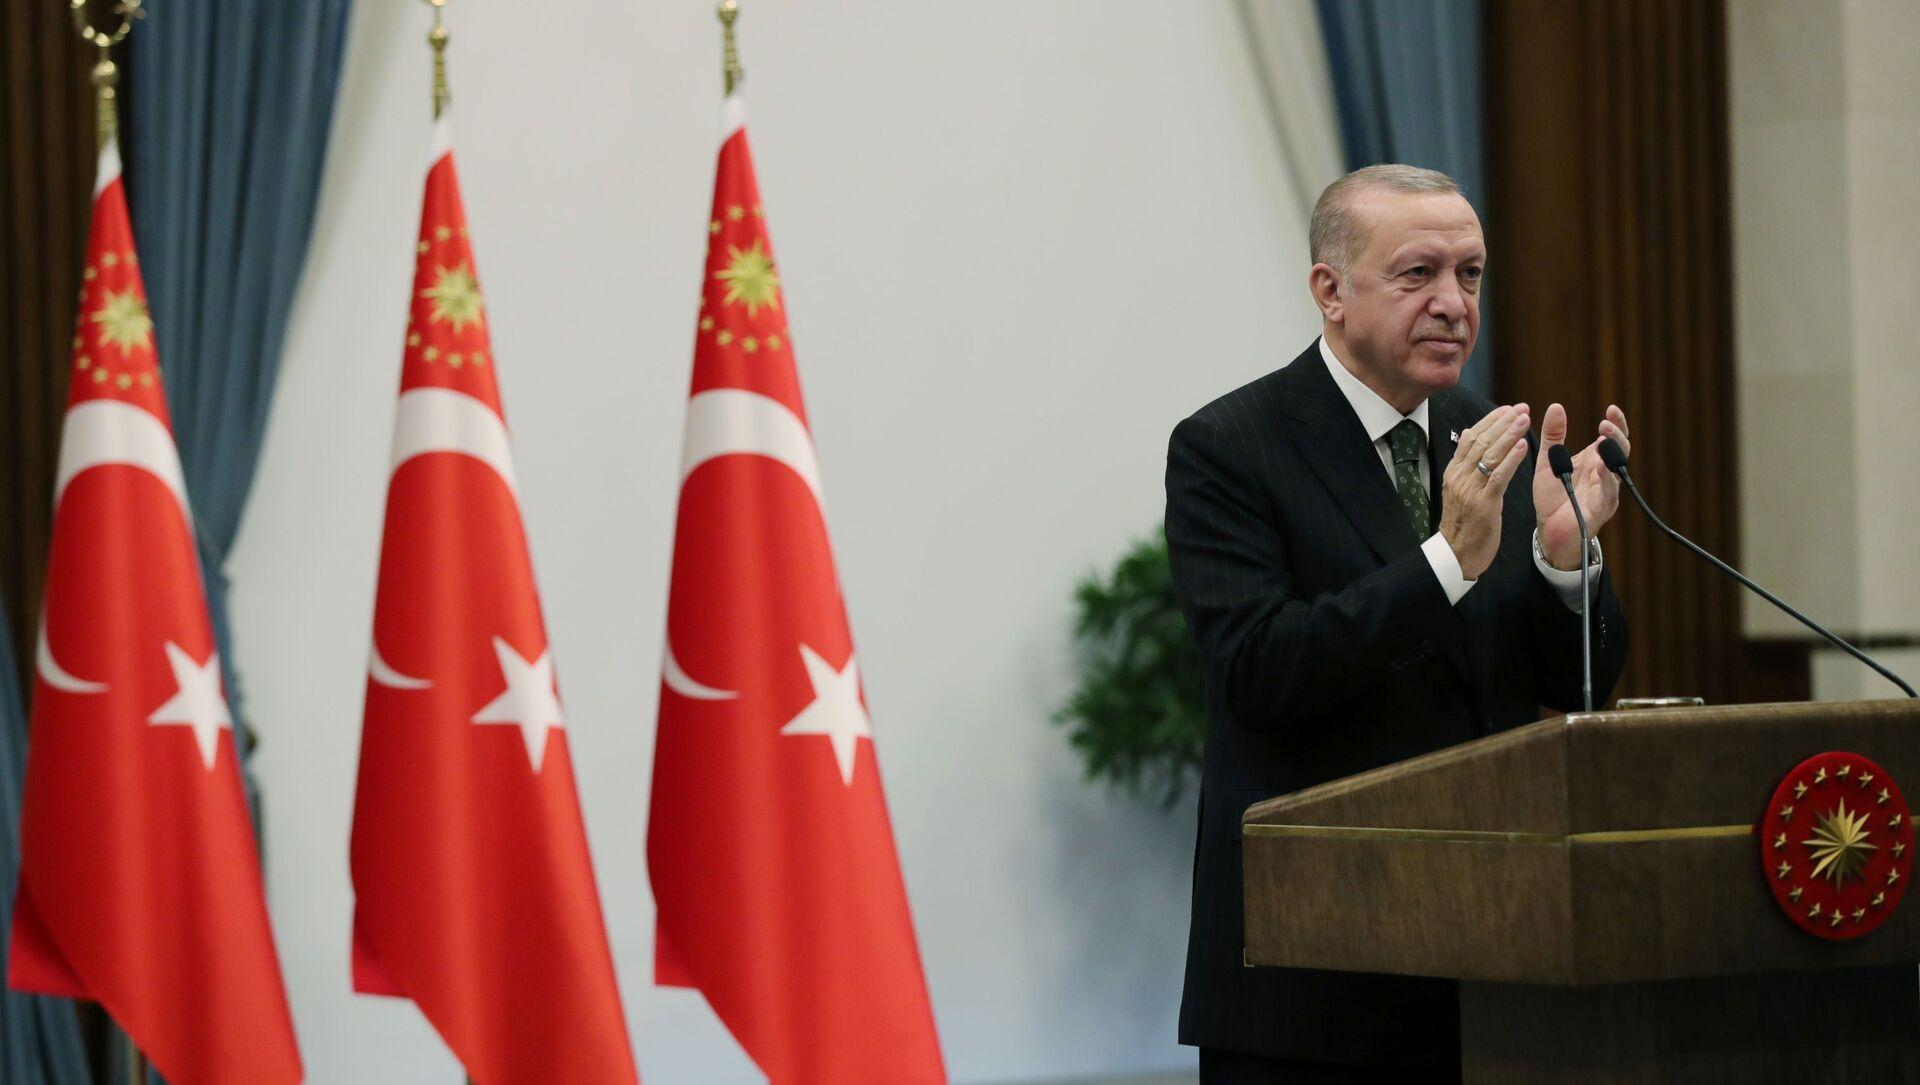 Президент Турции Реджеп Тайип Эрдоган, фото из архива  - Sputnik Азербайджан, 1920, 08.04.2021